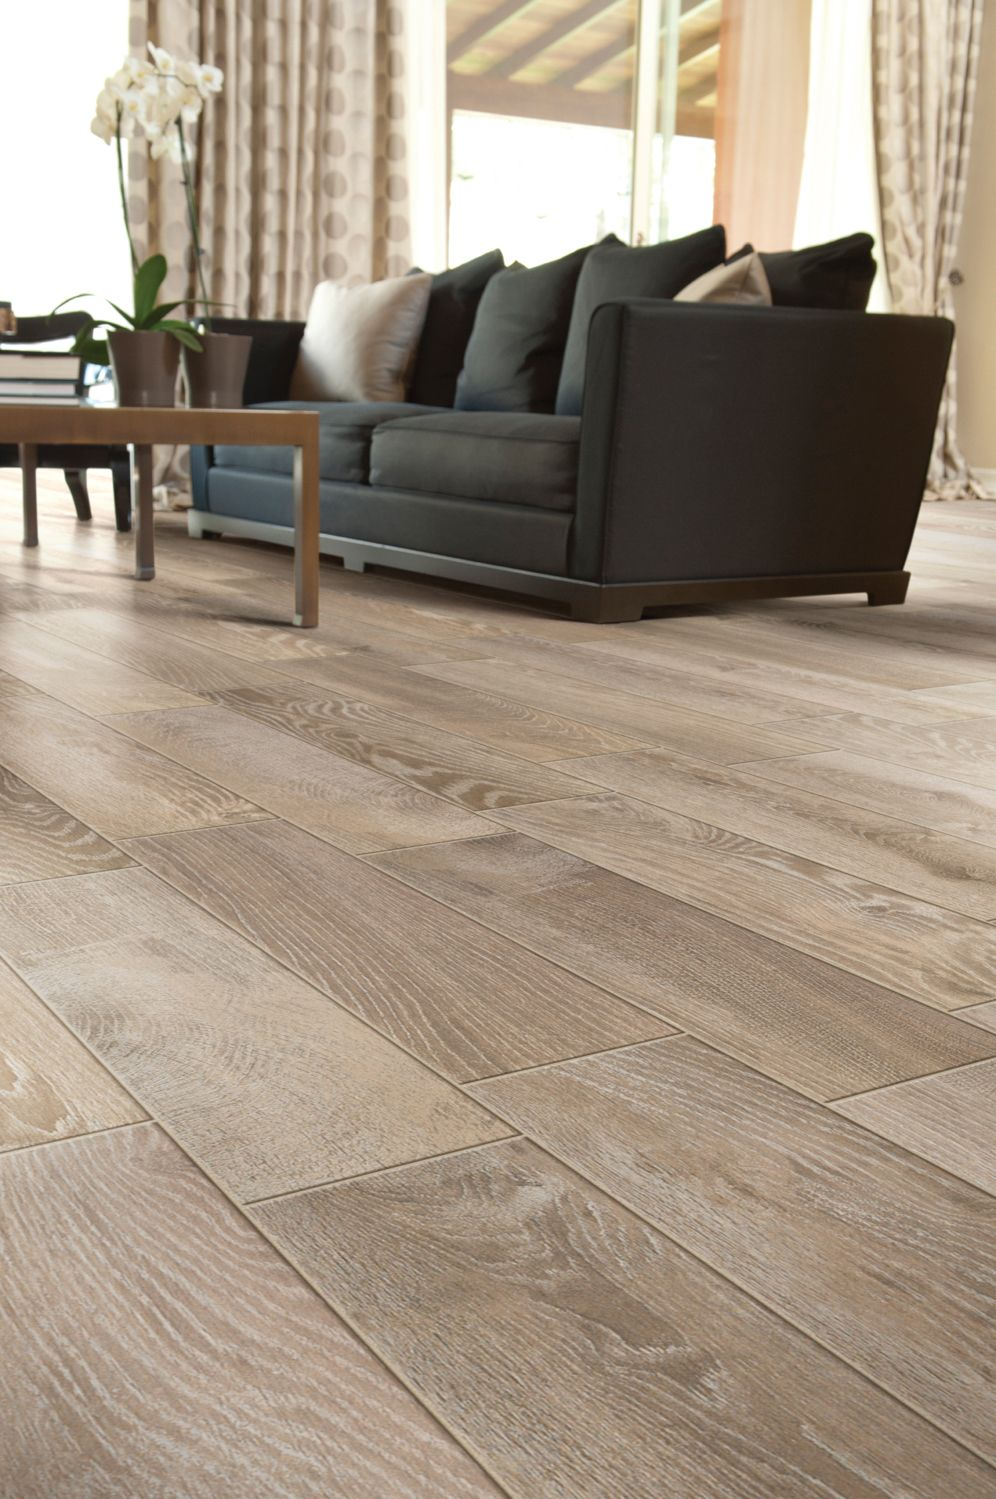 Porcelain wood tile flooring - rustic look - Modern Floors Grey Wood Tile Floors. Might Be From Http://ragnousa